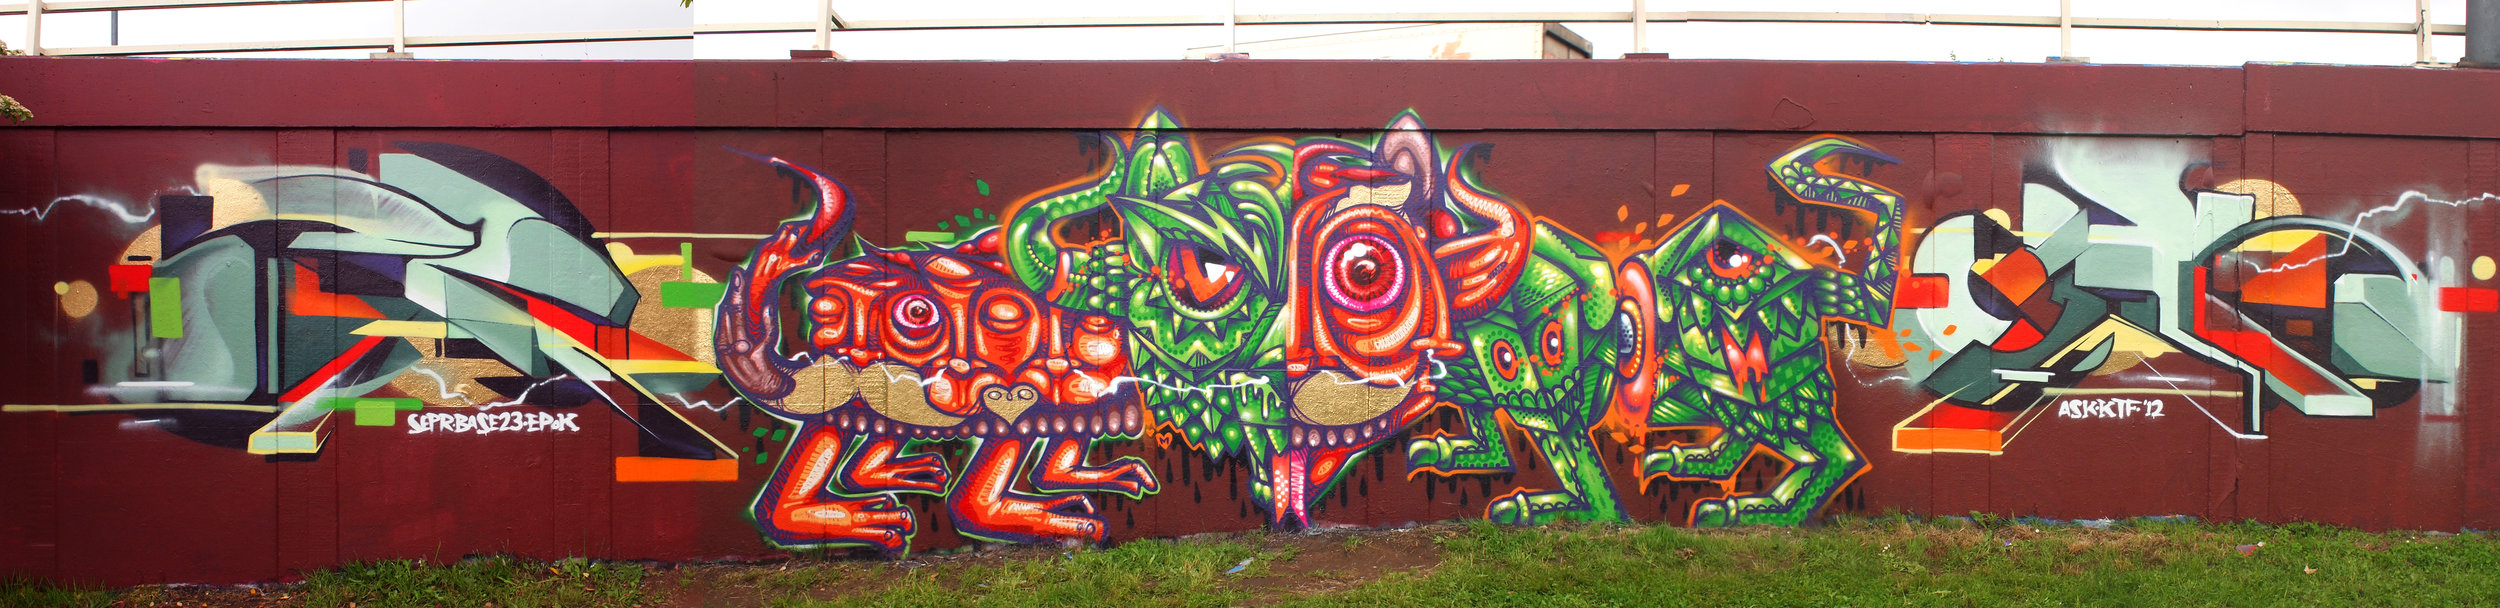 Bristol '12. With Epok & Base23